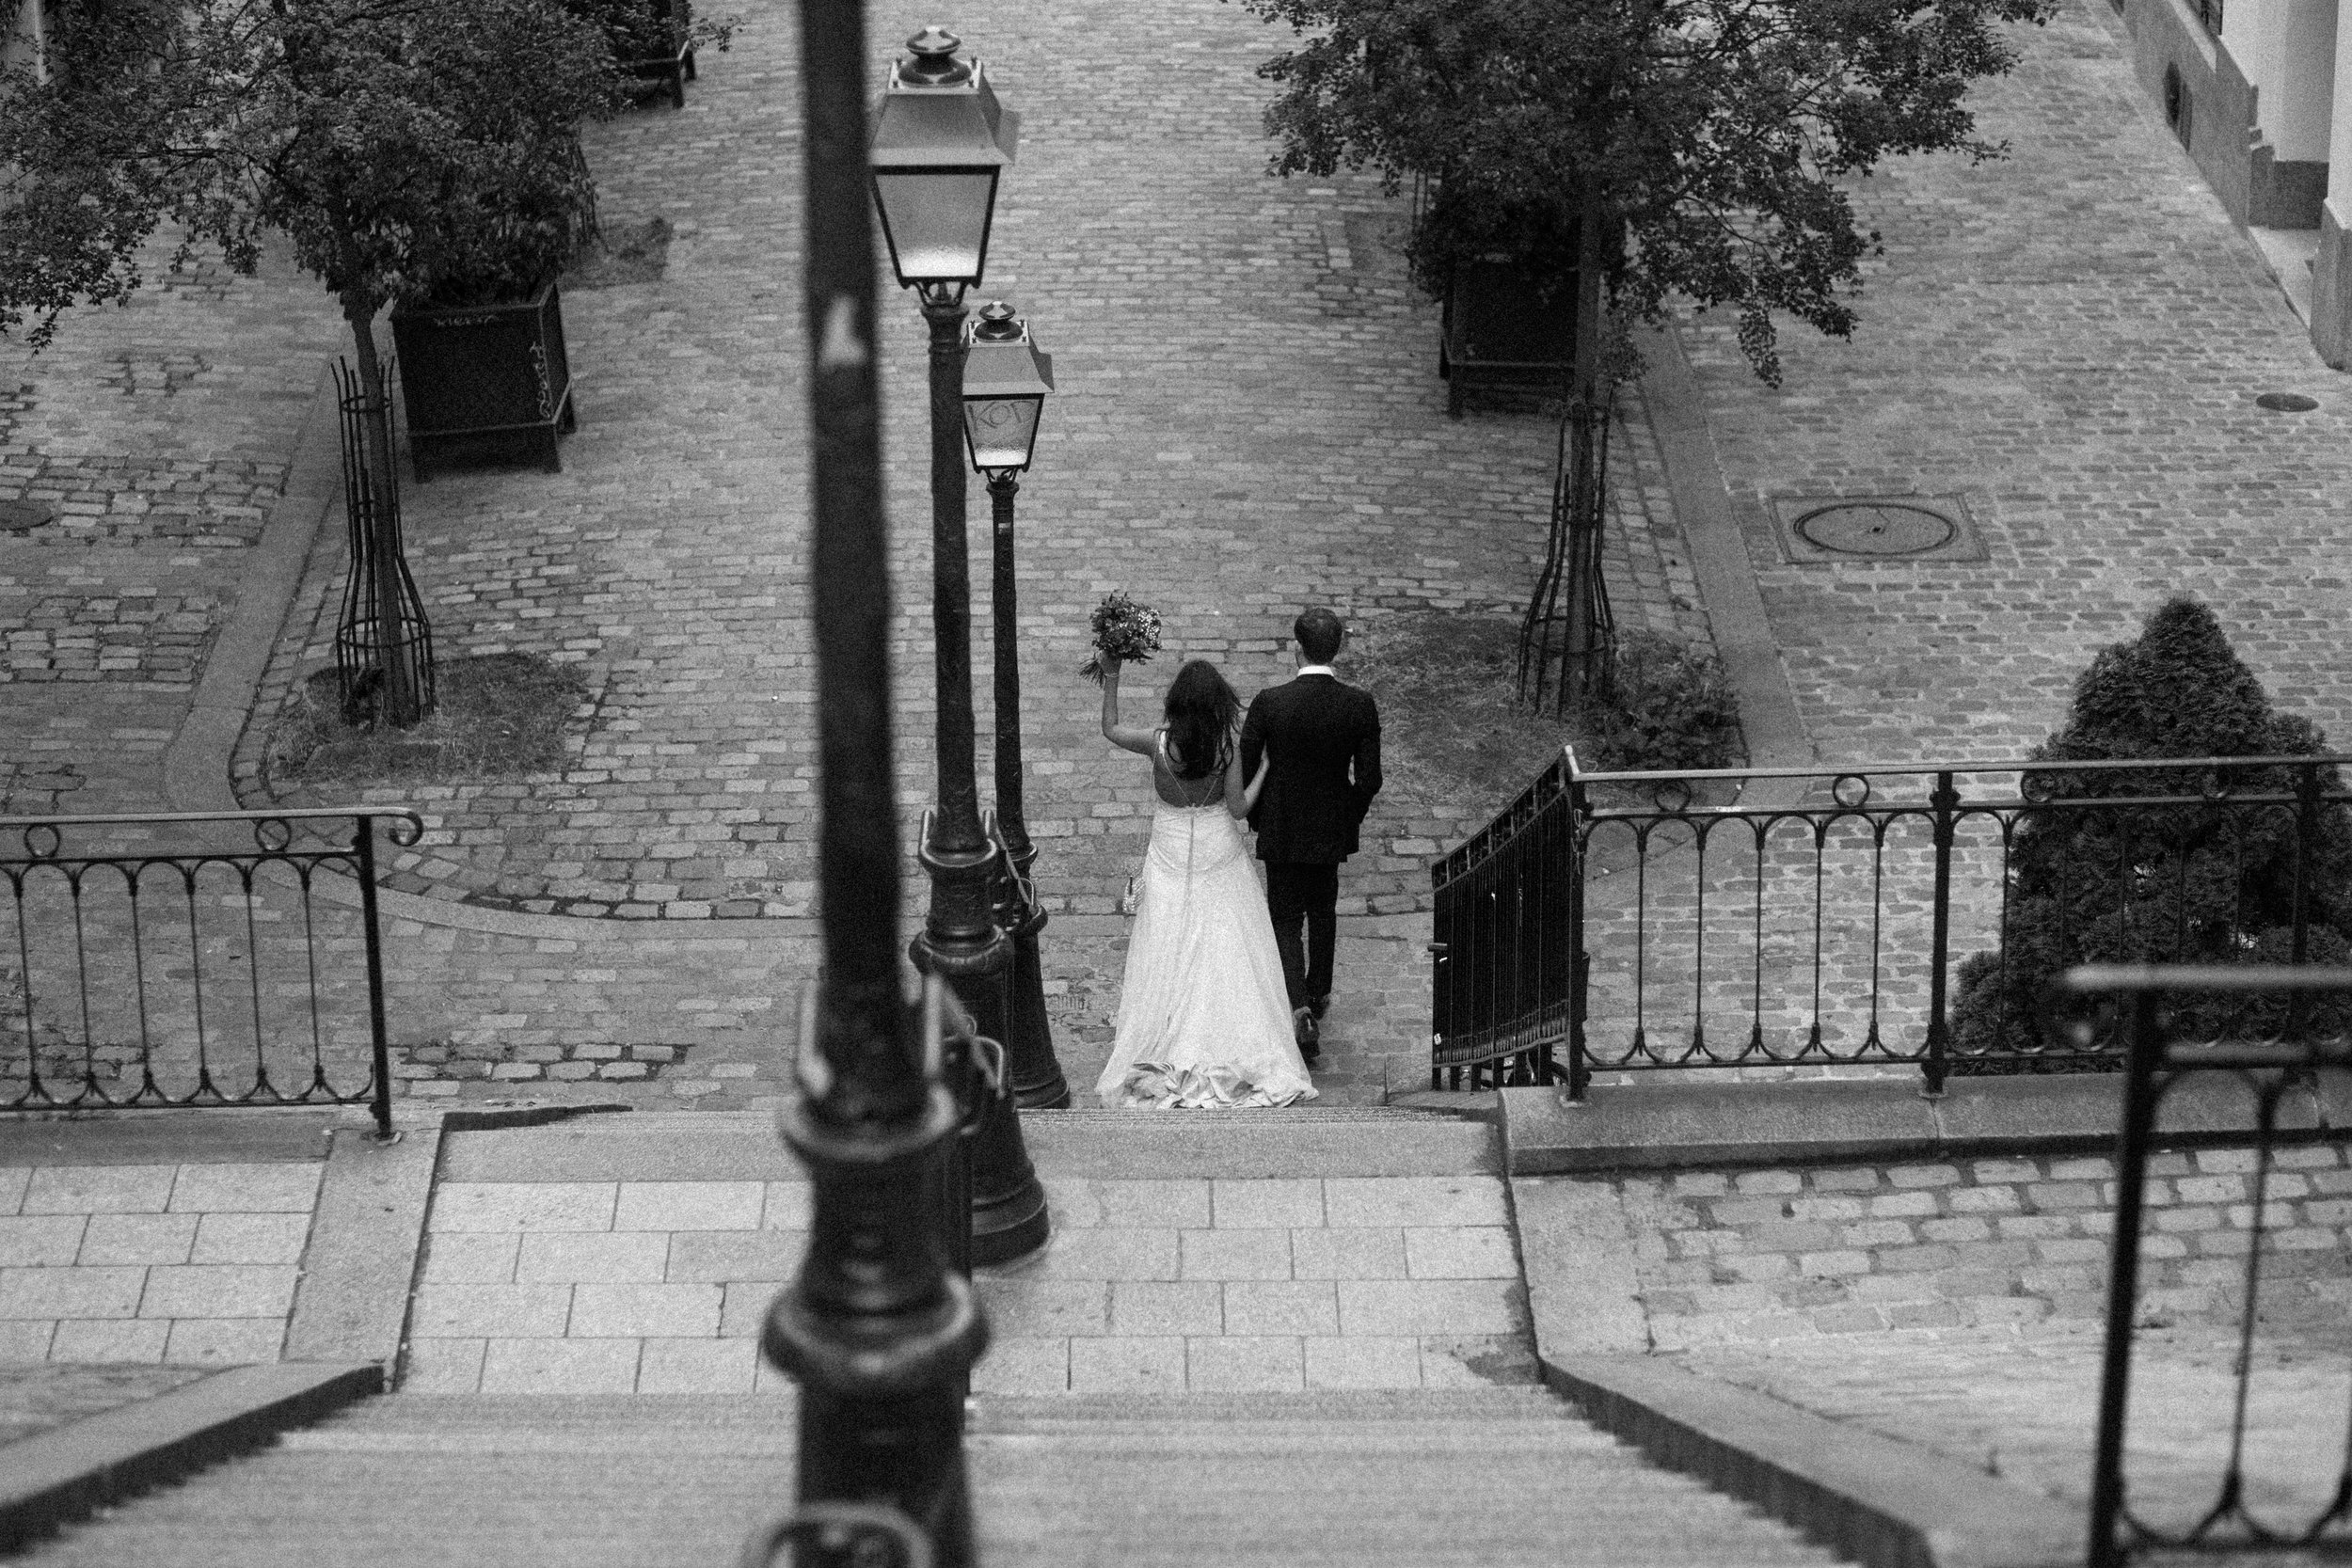 paris wedding photographer craig george hannah and mitch elopment-180.jpg